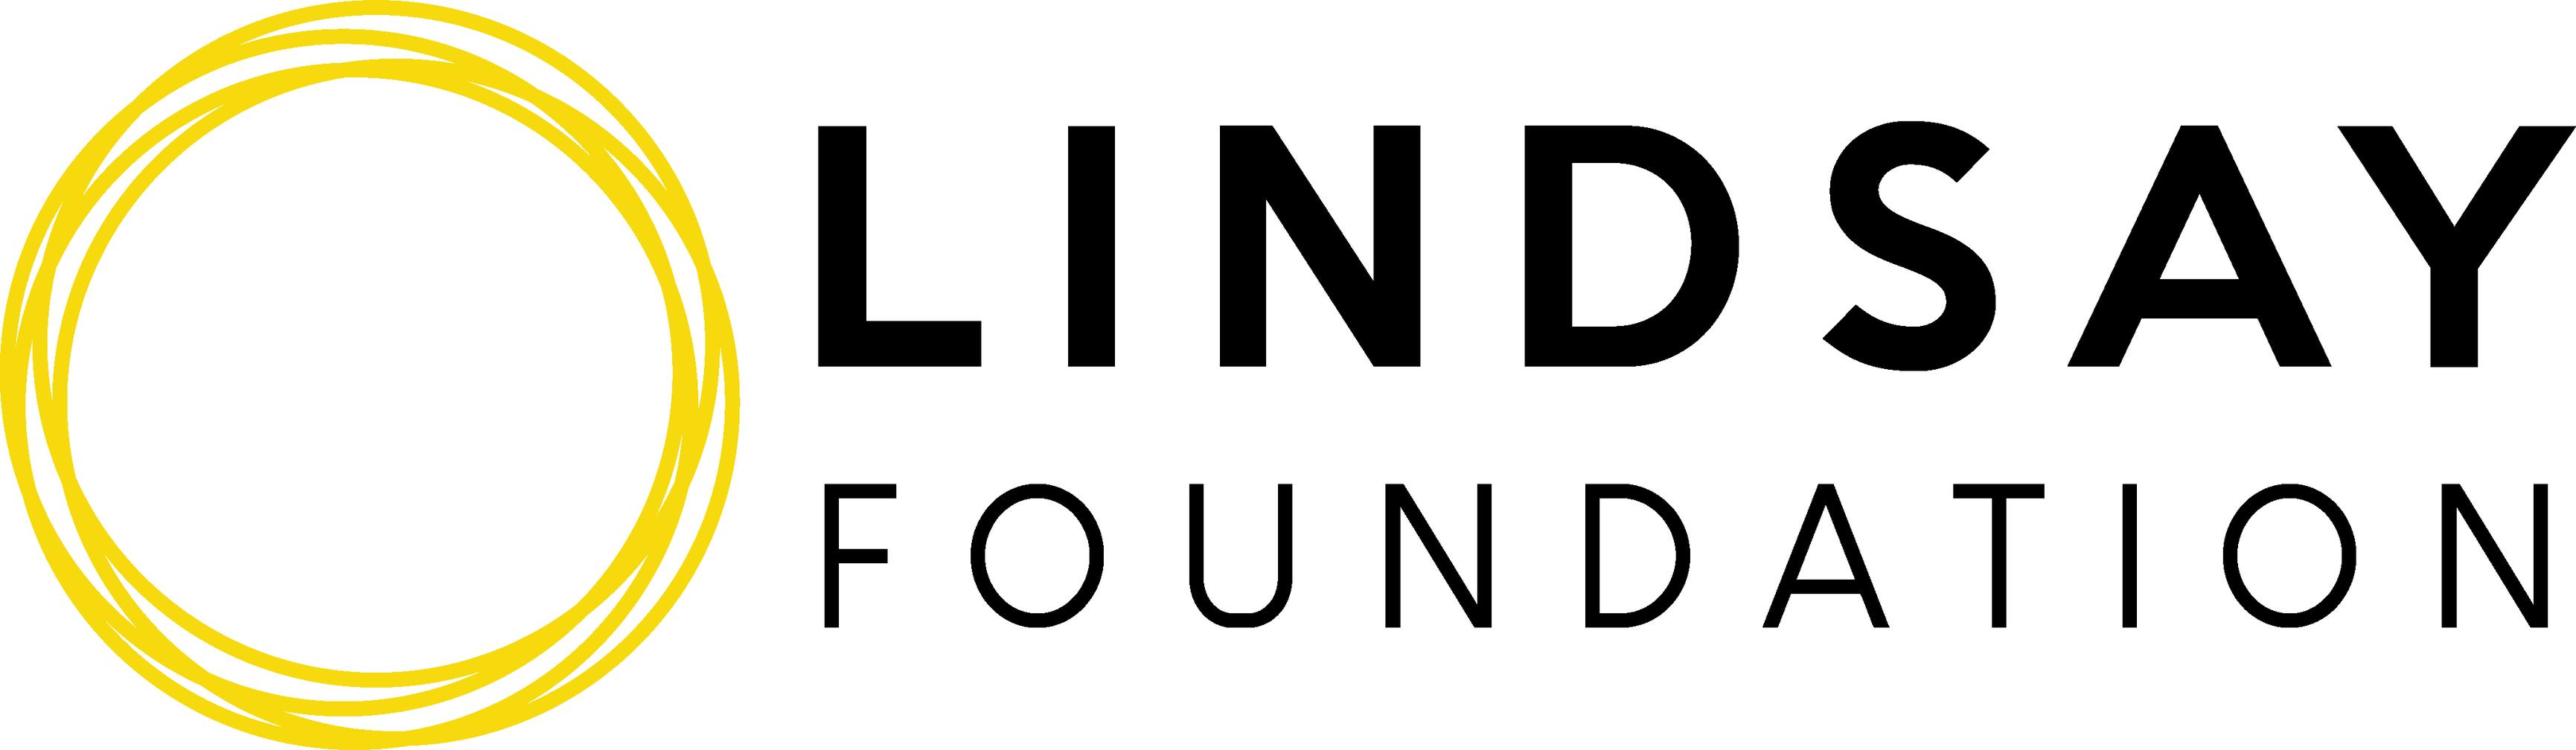 Lindsay Foundation A